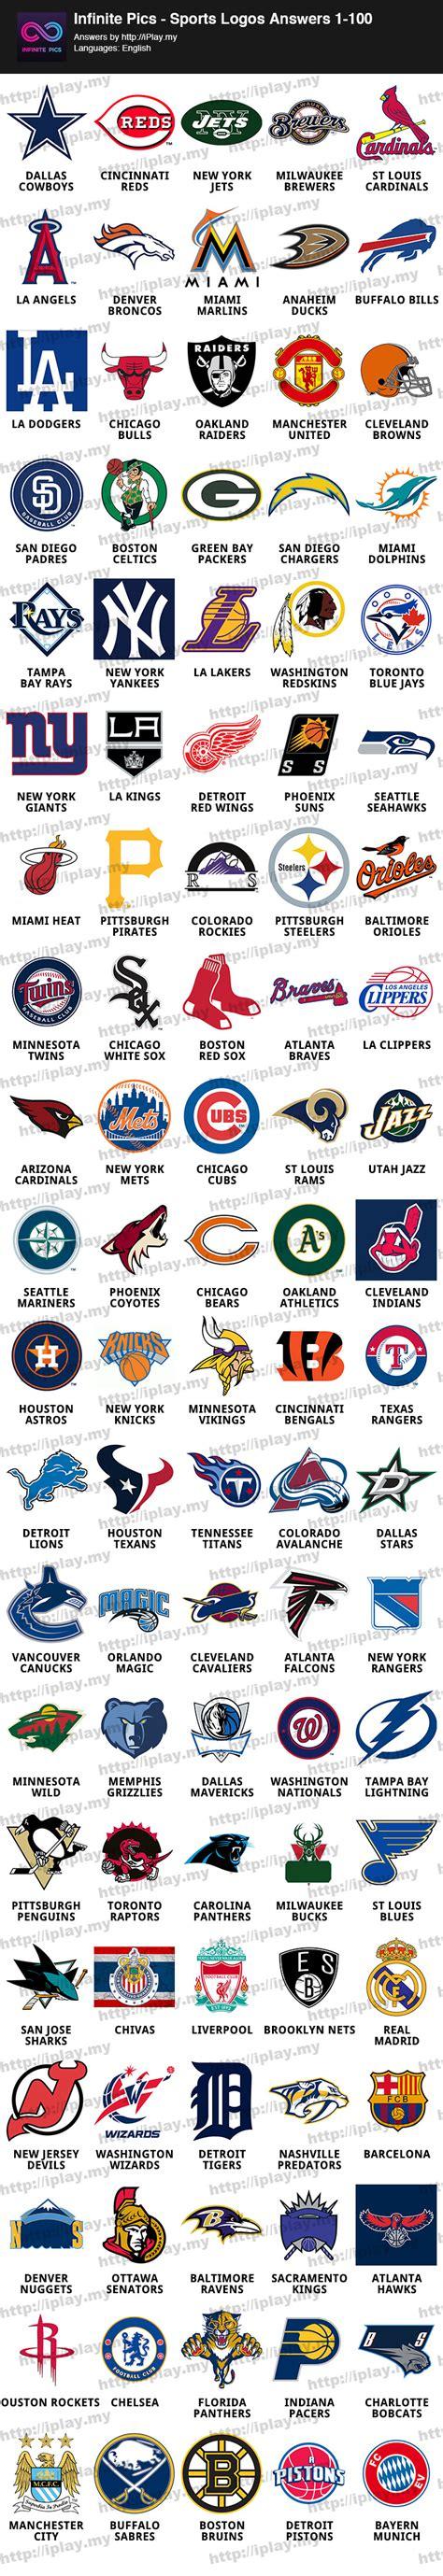 infinite pics sports logos answers iplaymy